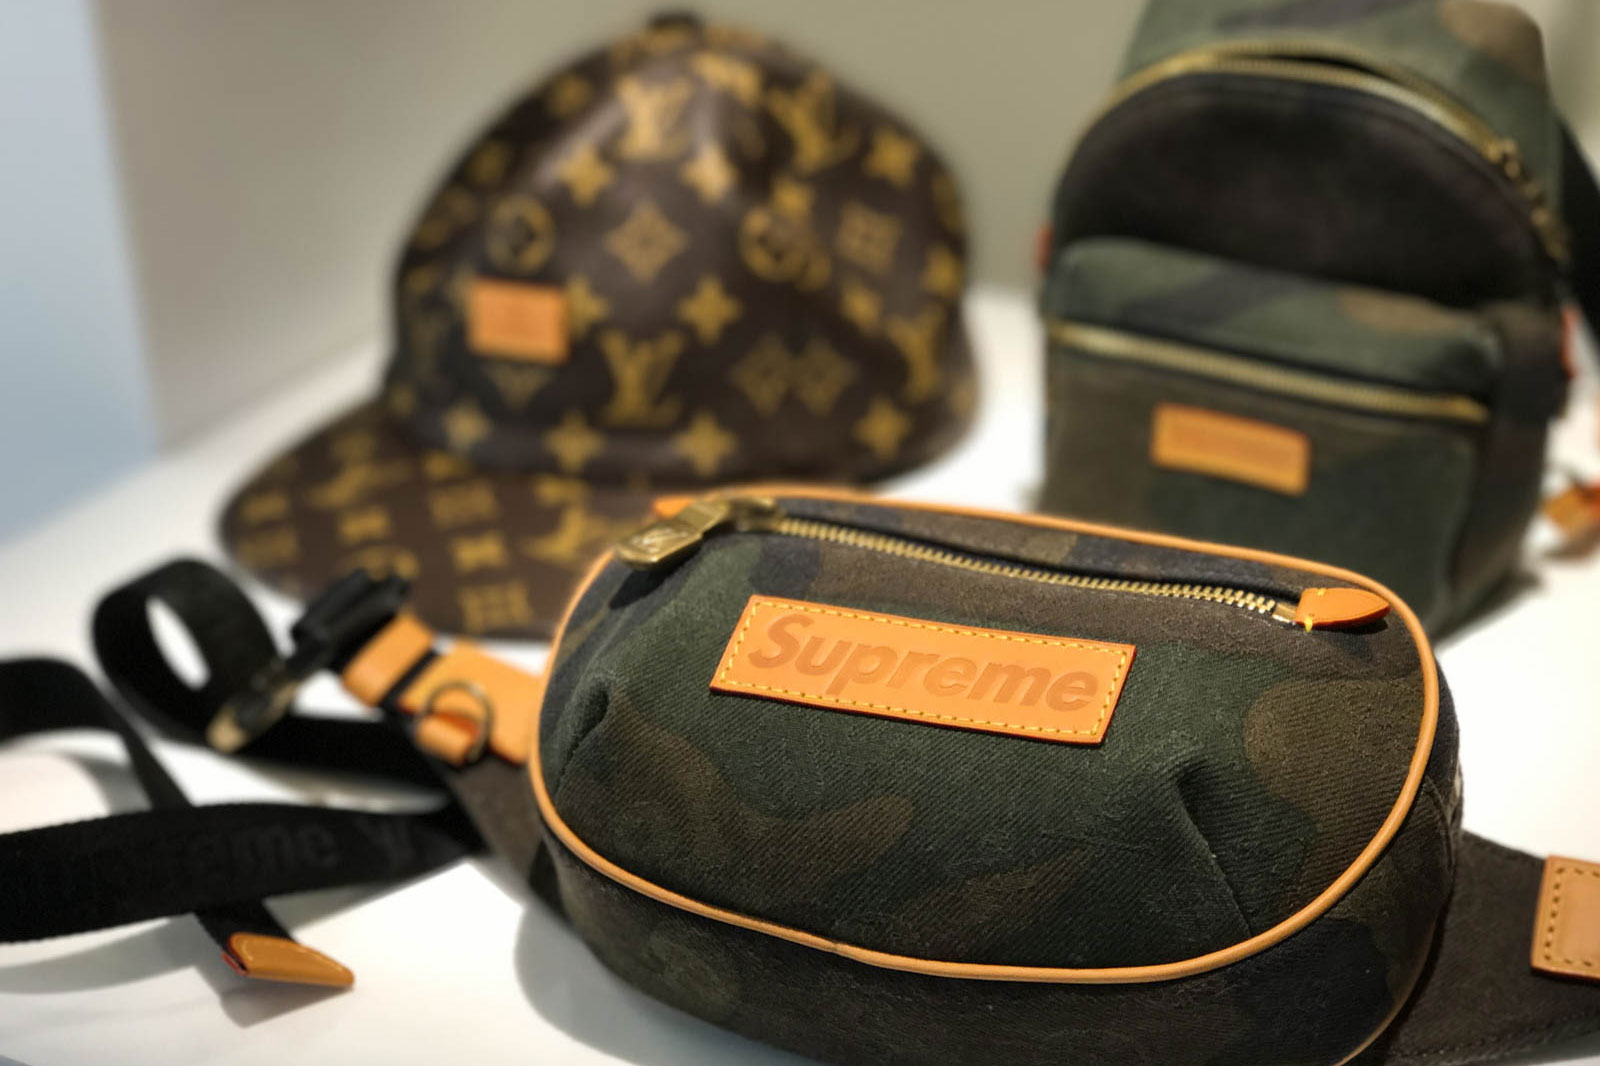 Supreme x Louis Vuitton 2017 Fall/Winter Closer Look Showroom - 3703532